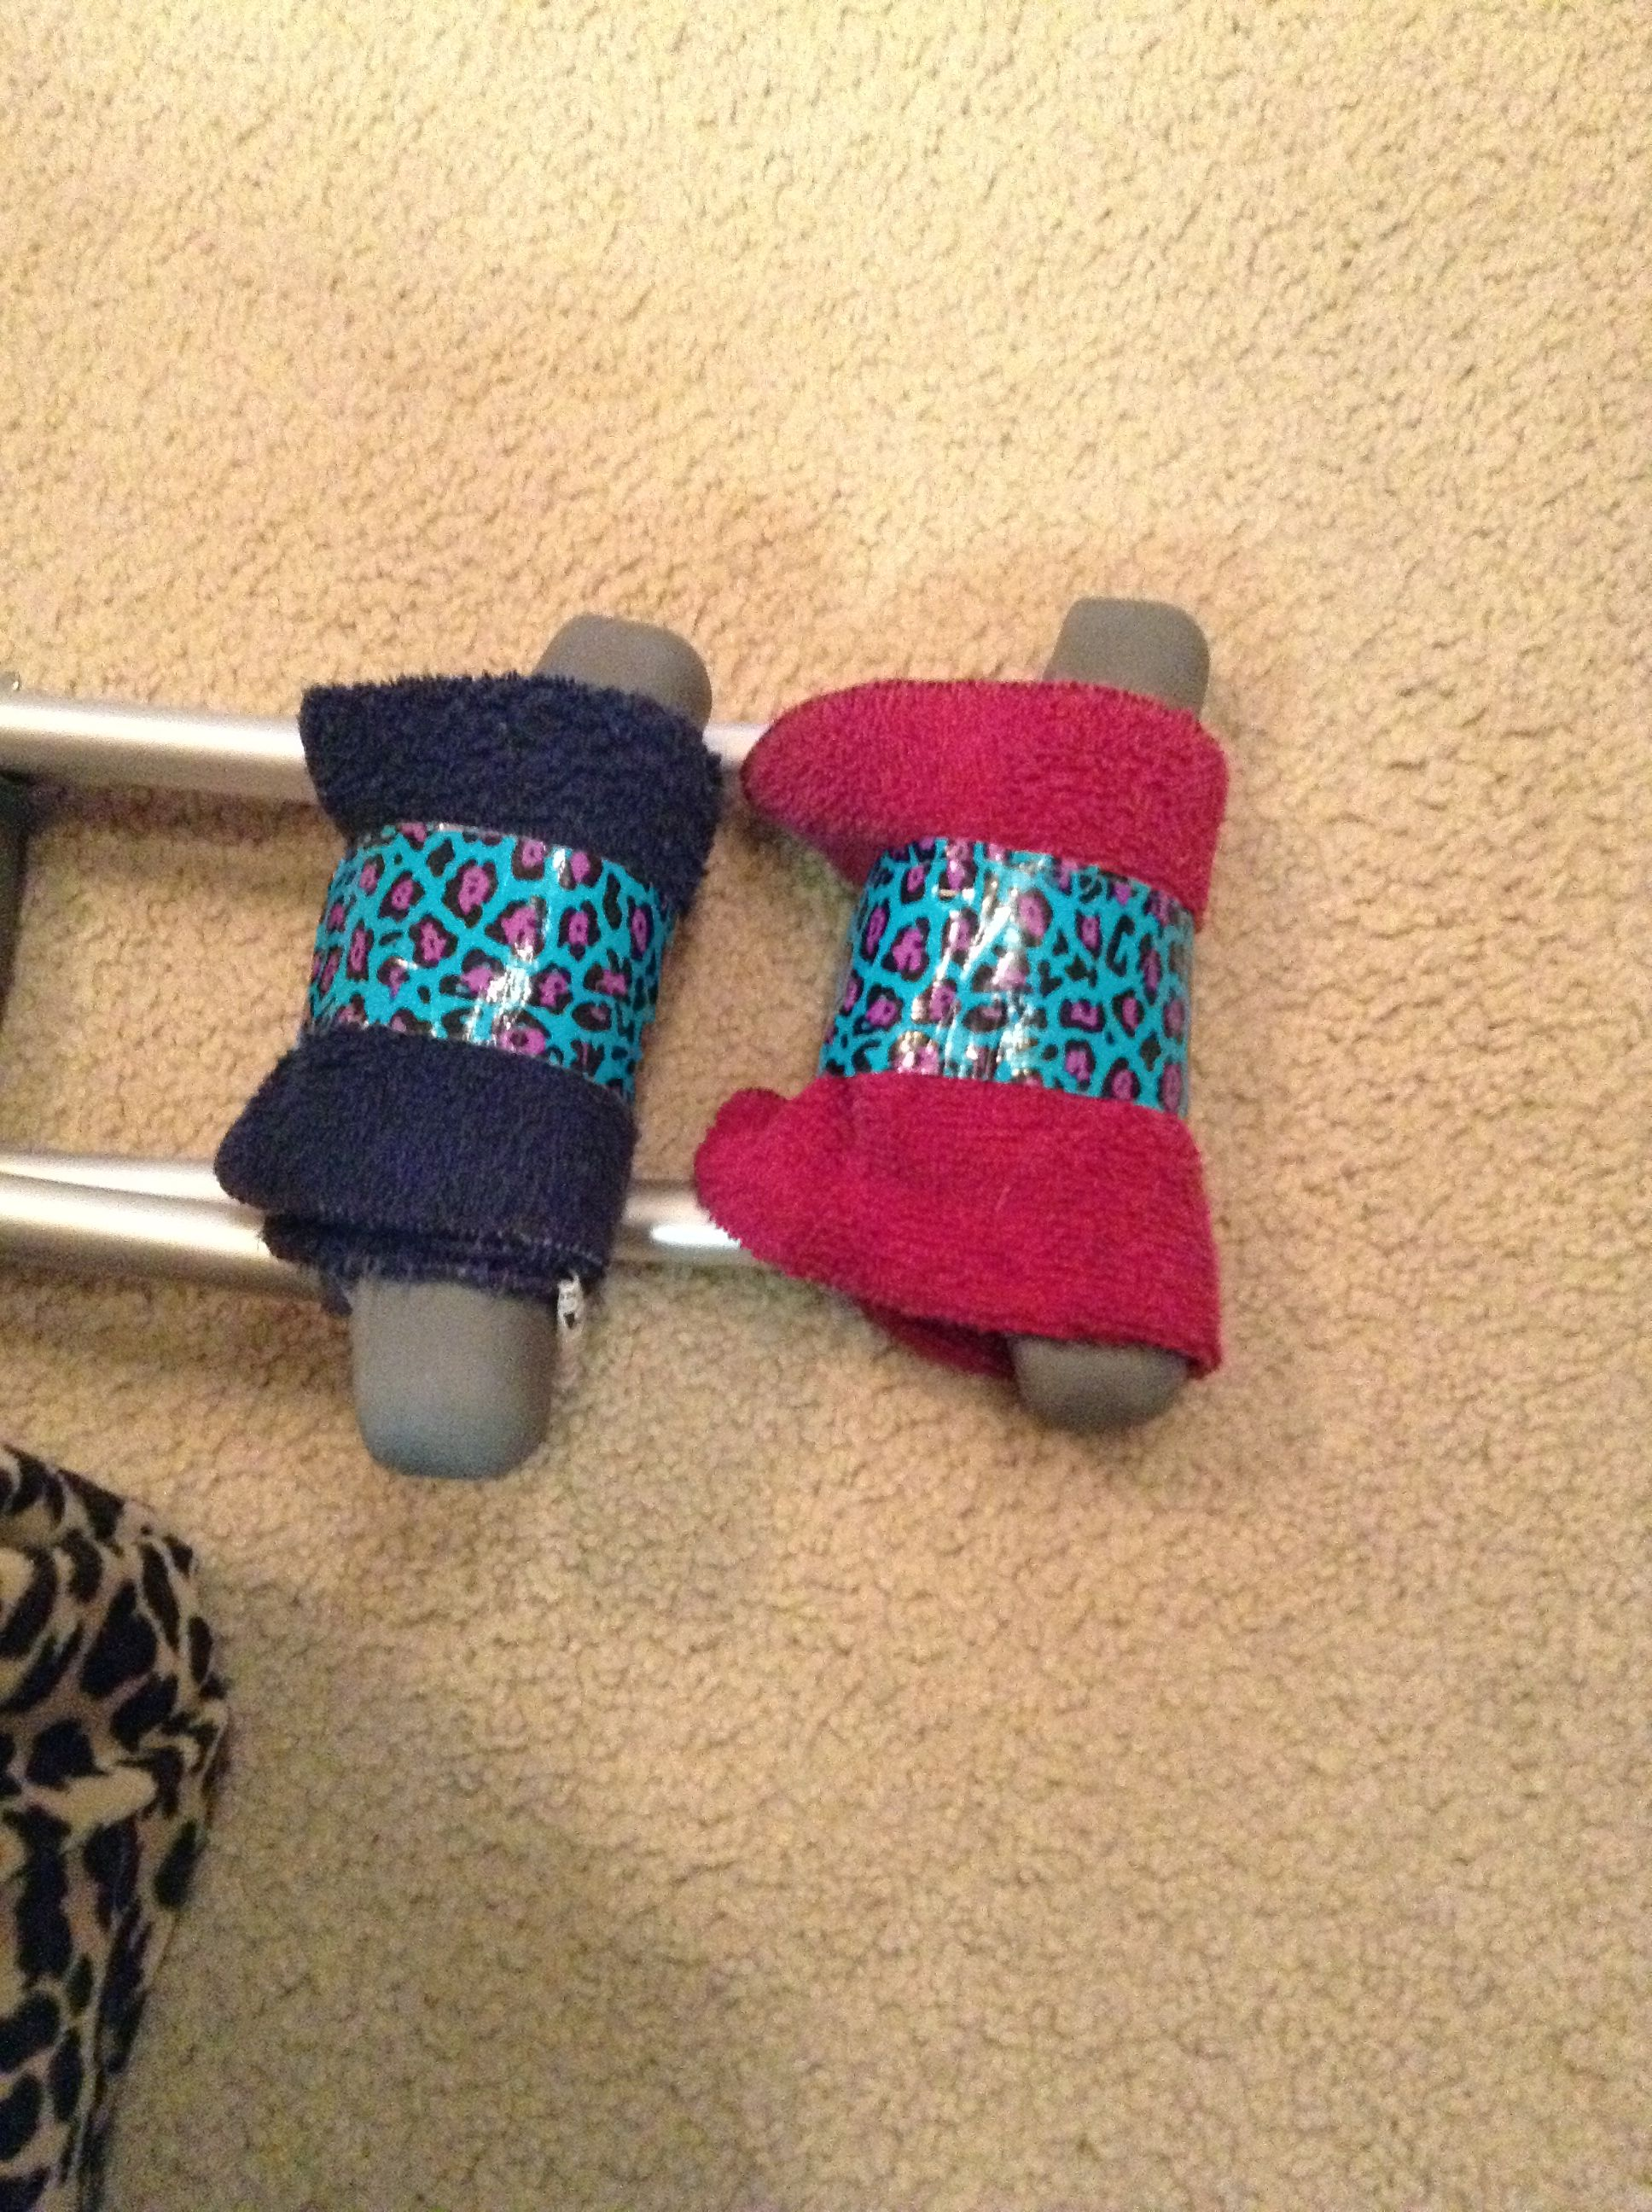 Pads For Crutches 2 Washcloths Ductape Crutches Diy Crutches Padding Diy Crutch Pad